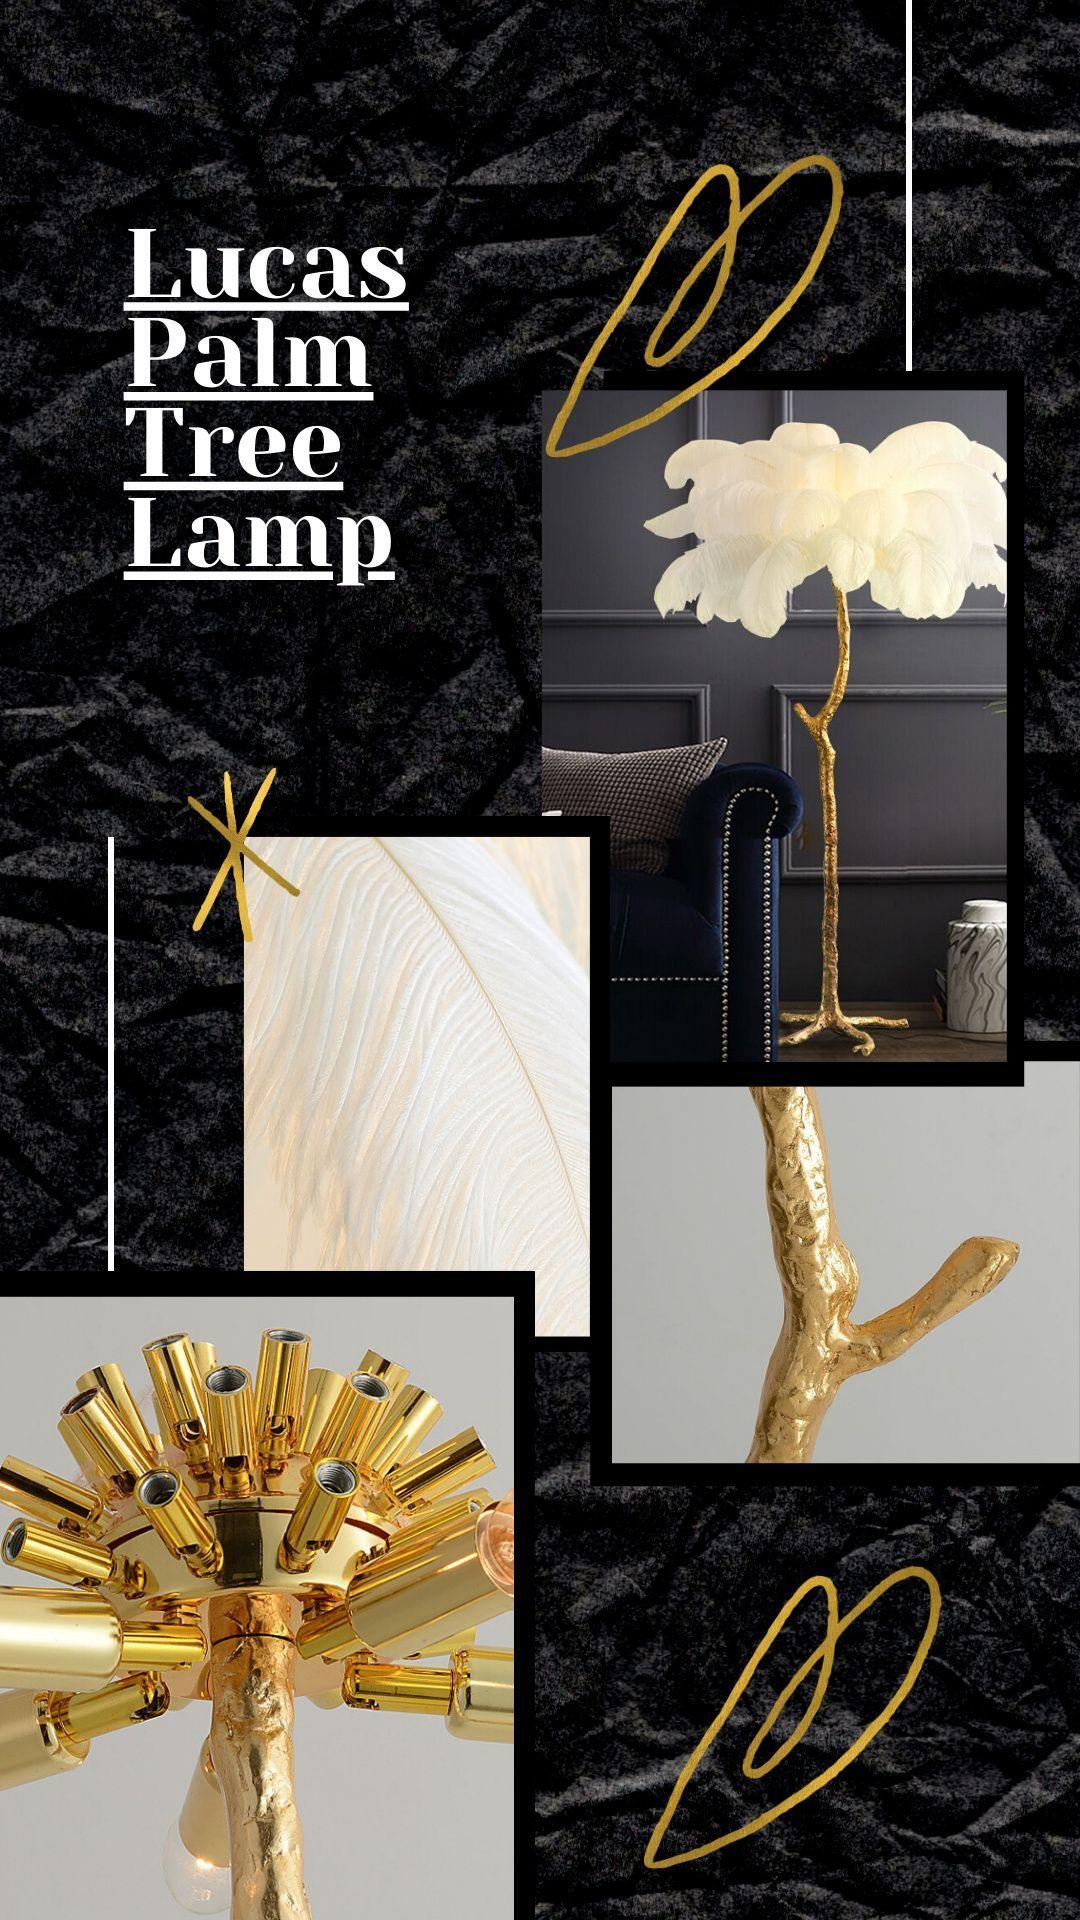 Lucas Palm Tree Lamp In 2020 Tree Lamp Beautiful Floor Lamps Unusual Lamps